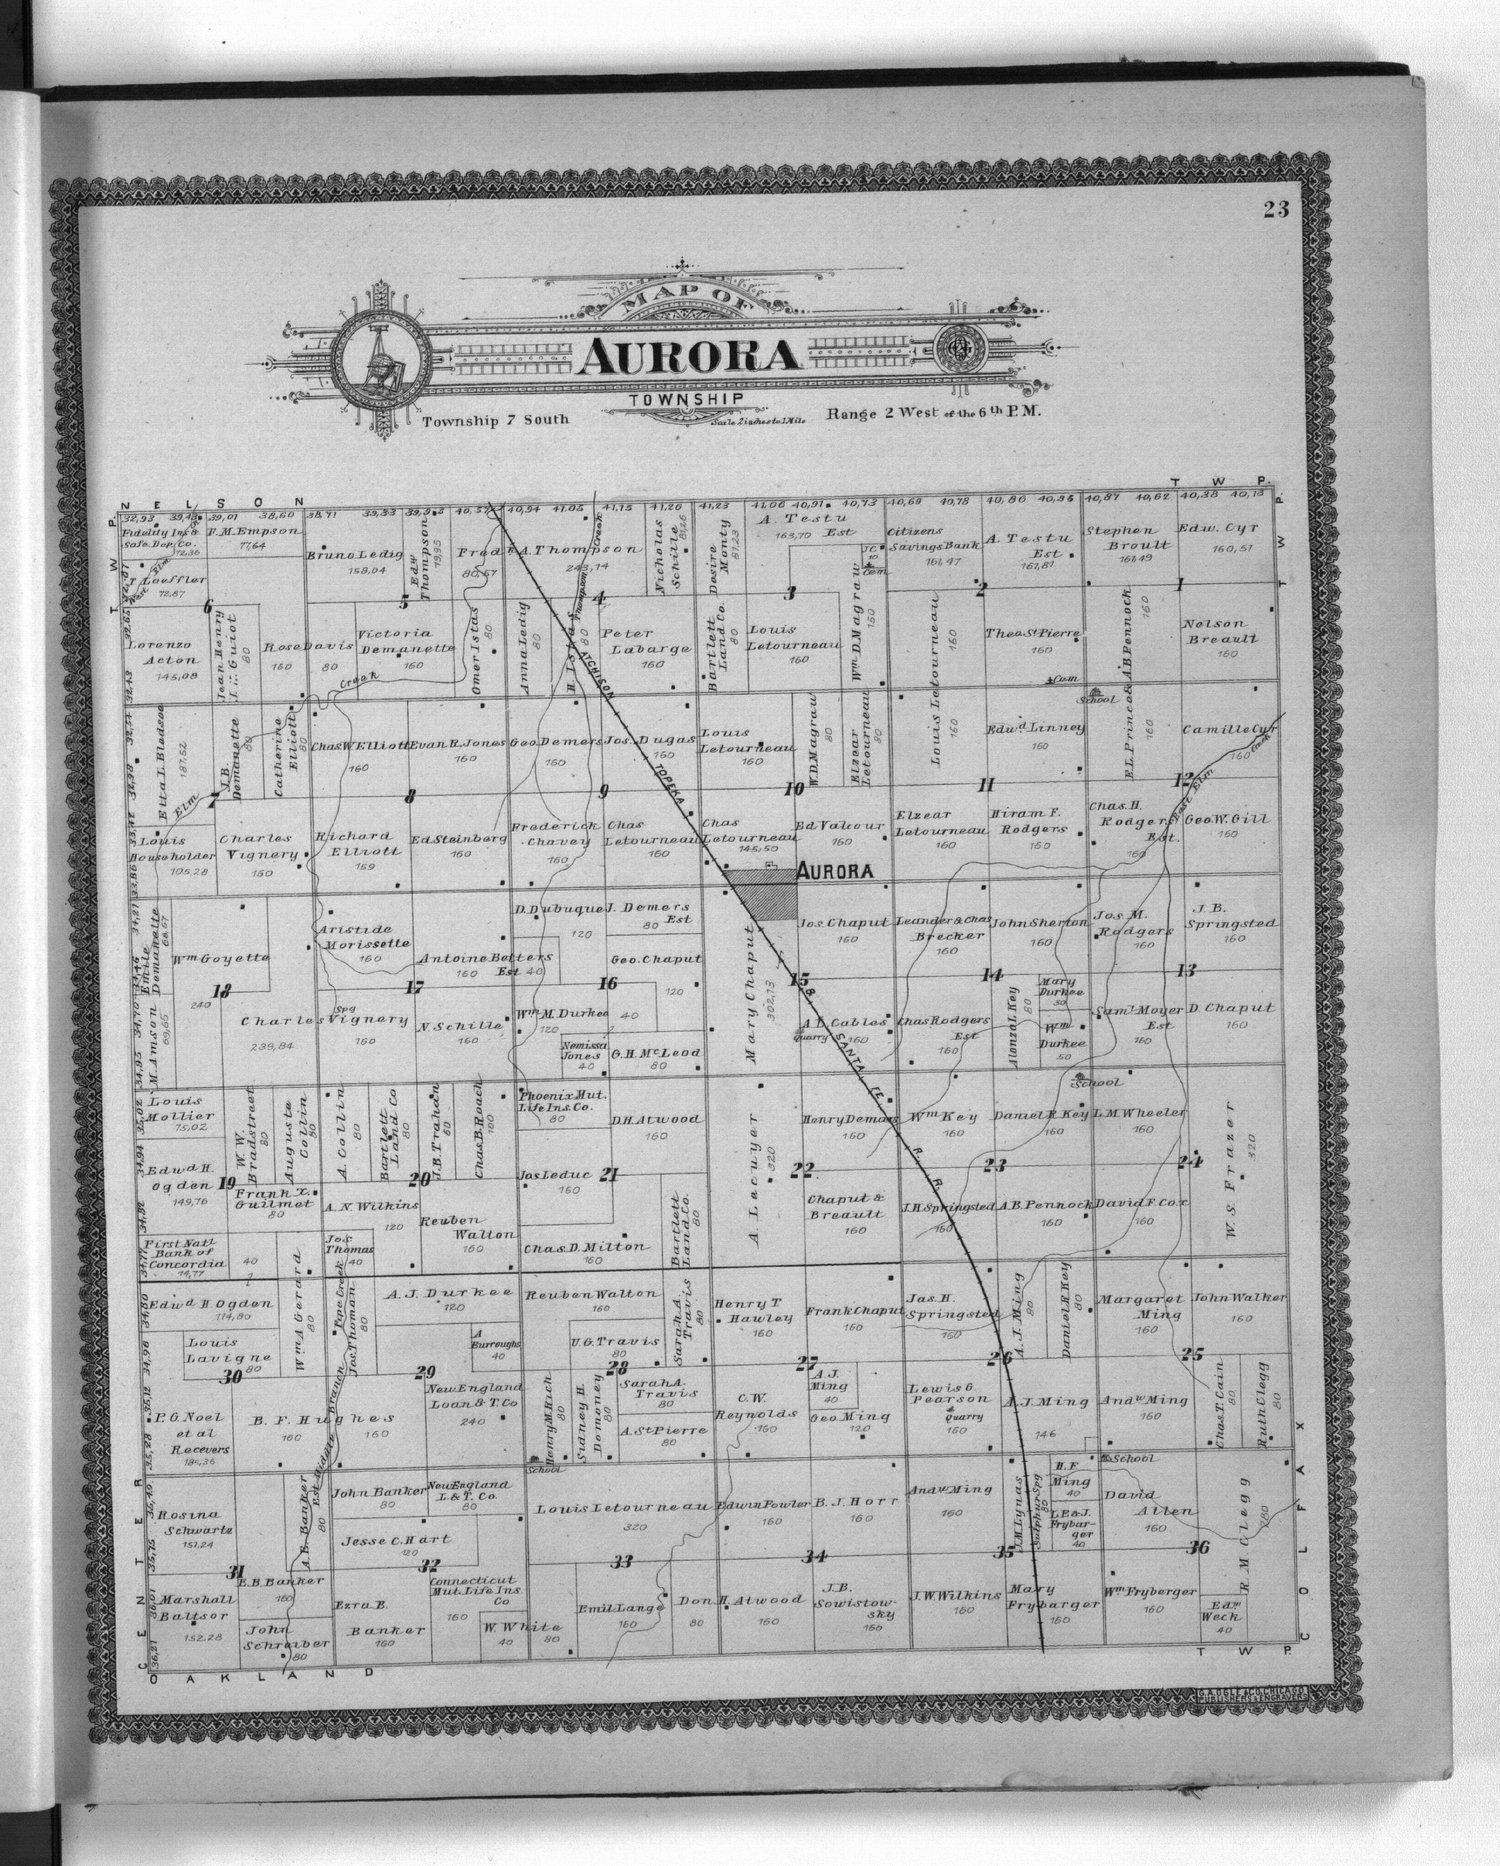 Standard atlas of Cloud County, Kansas - 23